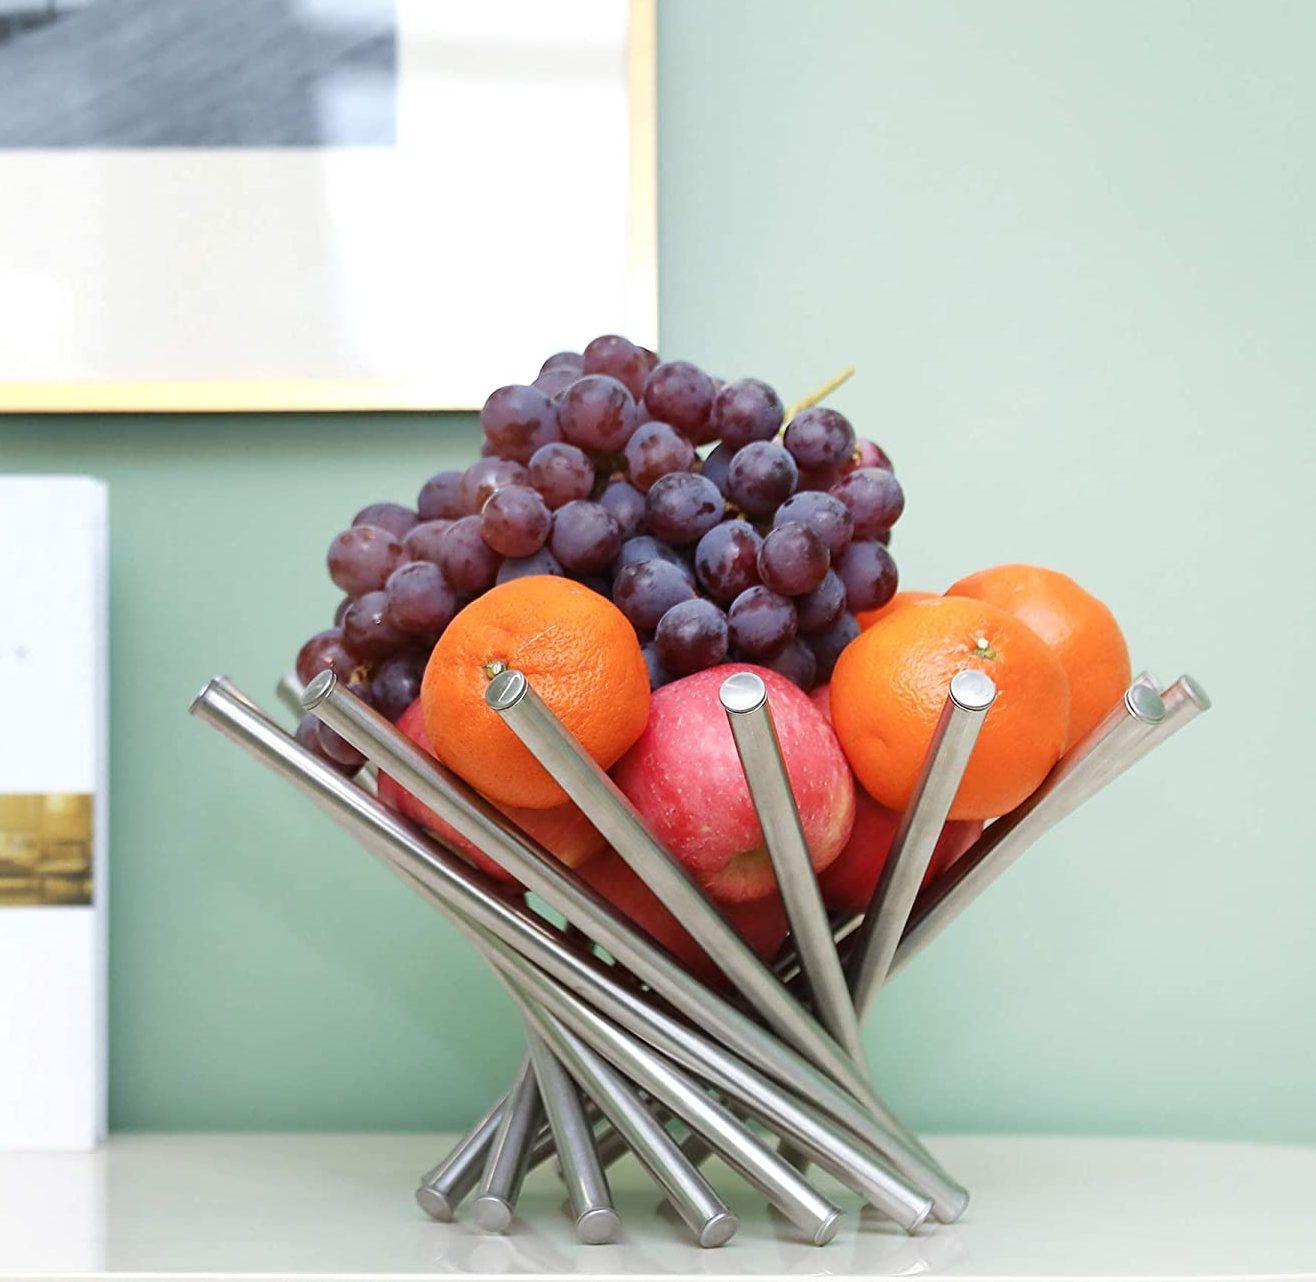 KQGO Stainless Steel Fruit Basket Bowl Holder (Silver)